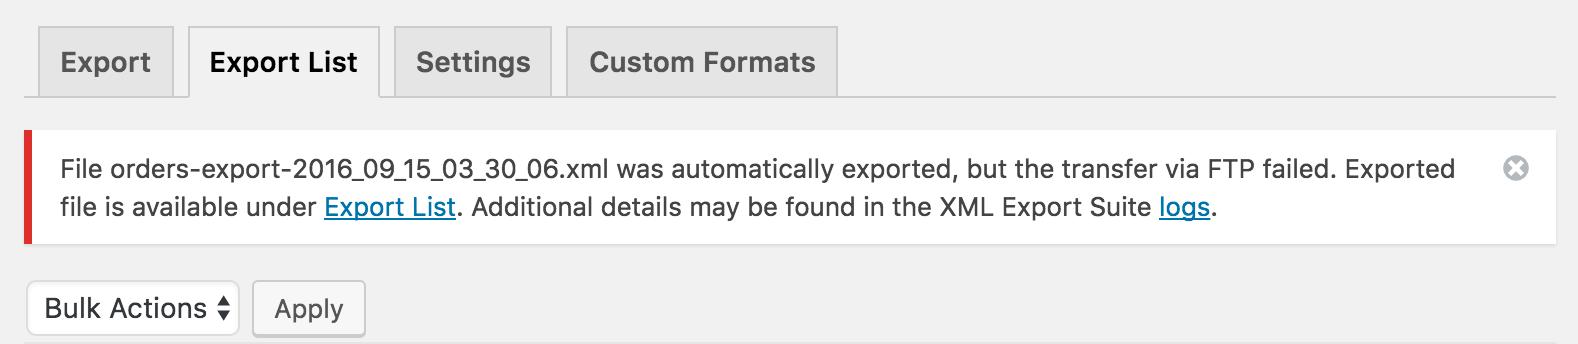 Woocommerce Customer Order Xml Export Suite Woocommerce